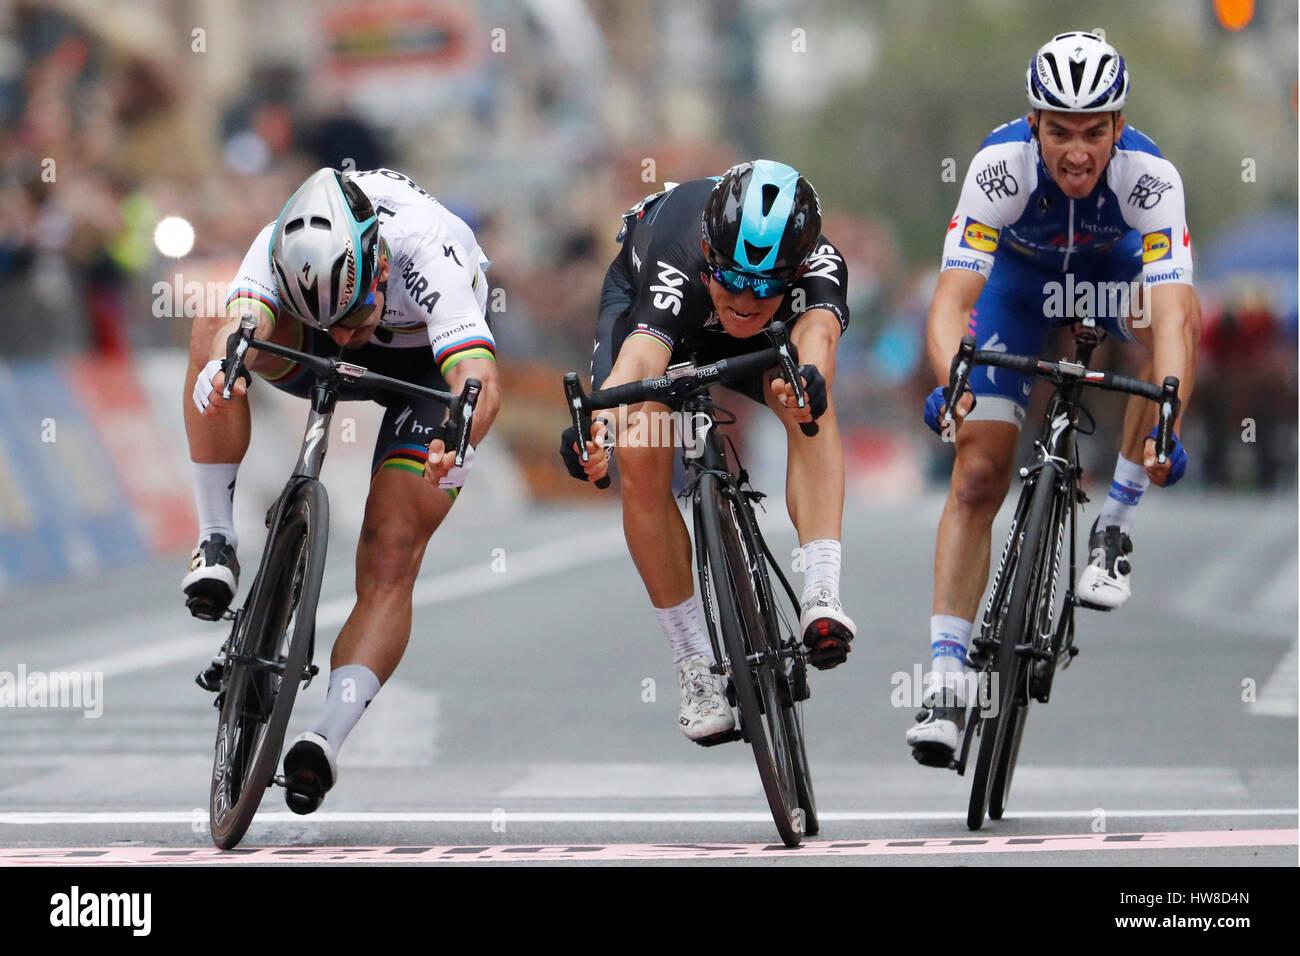 18 März 2017 108. Milano - Sanremo 1.: Michal KWIATKOWSKI (POL) Sky 2.: SAGAN Peter (SVK) Bora - Hansgrohe Stockbild